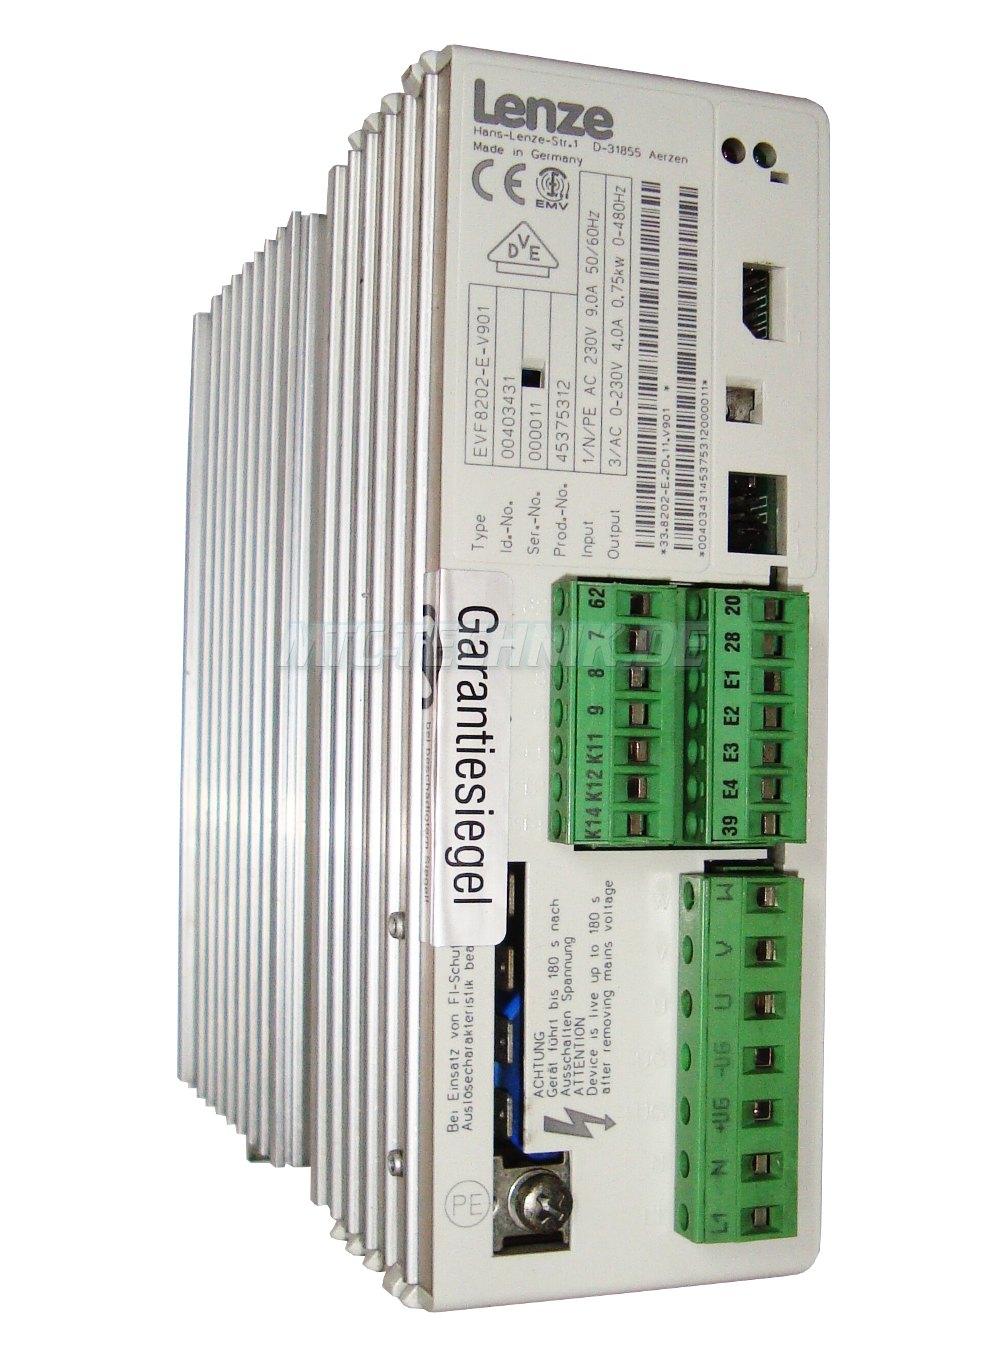 1 Lenze Online Shop Evf8202-e-v901 Frequenzumrichter